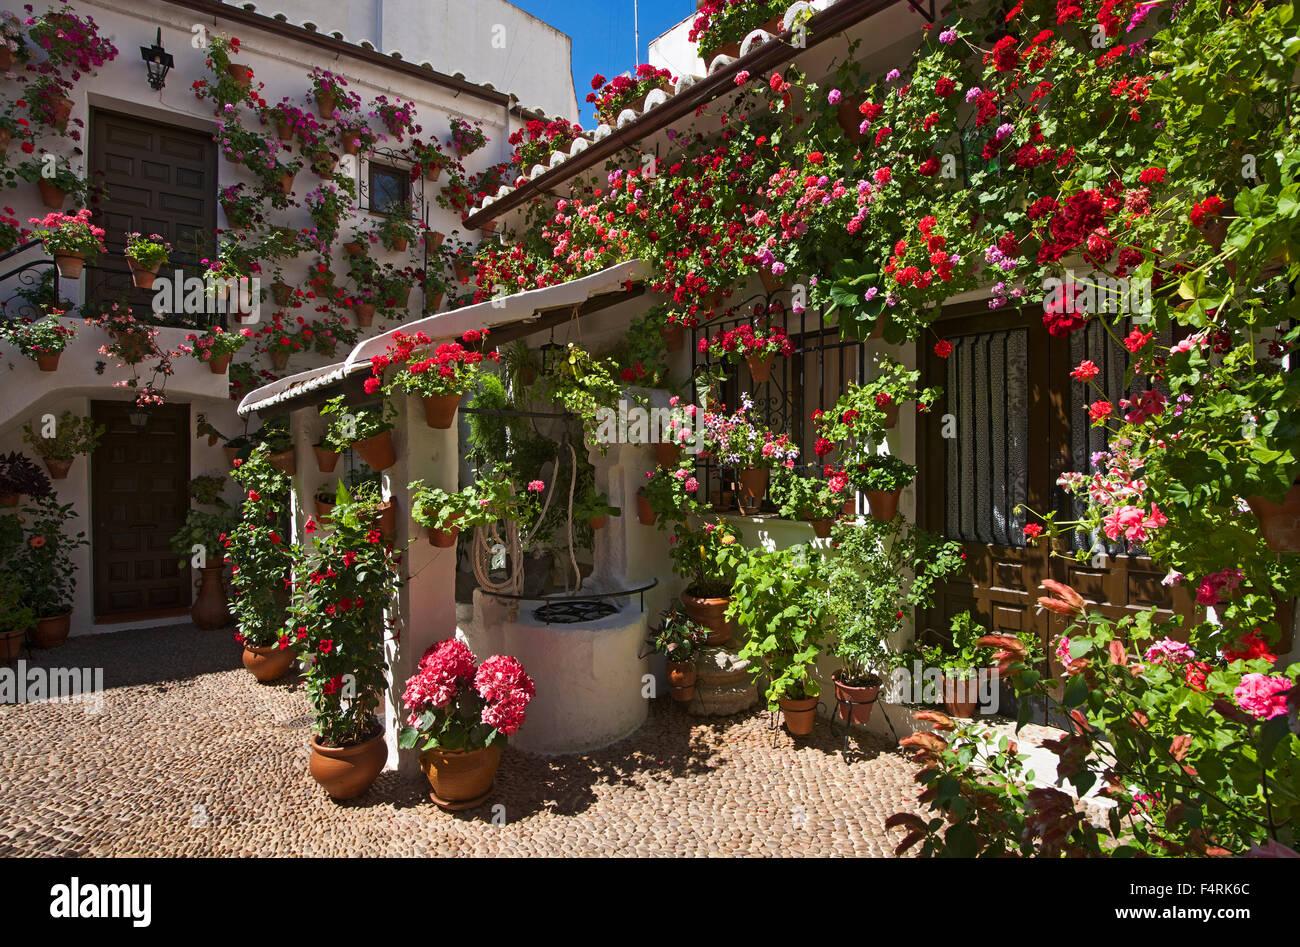 Andalusia, Spain, Europe, Outside, Day, Cordoba, Fiesta De Los Patios